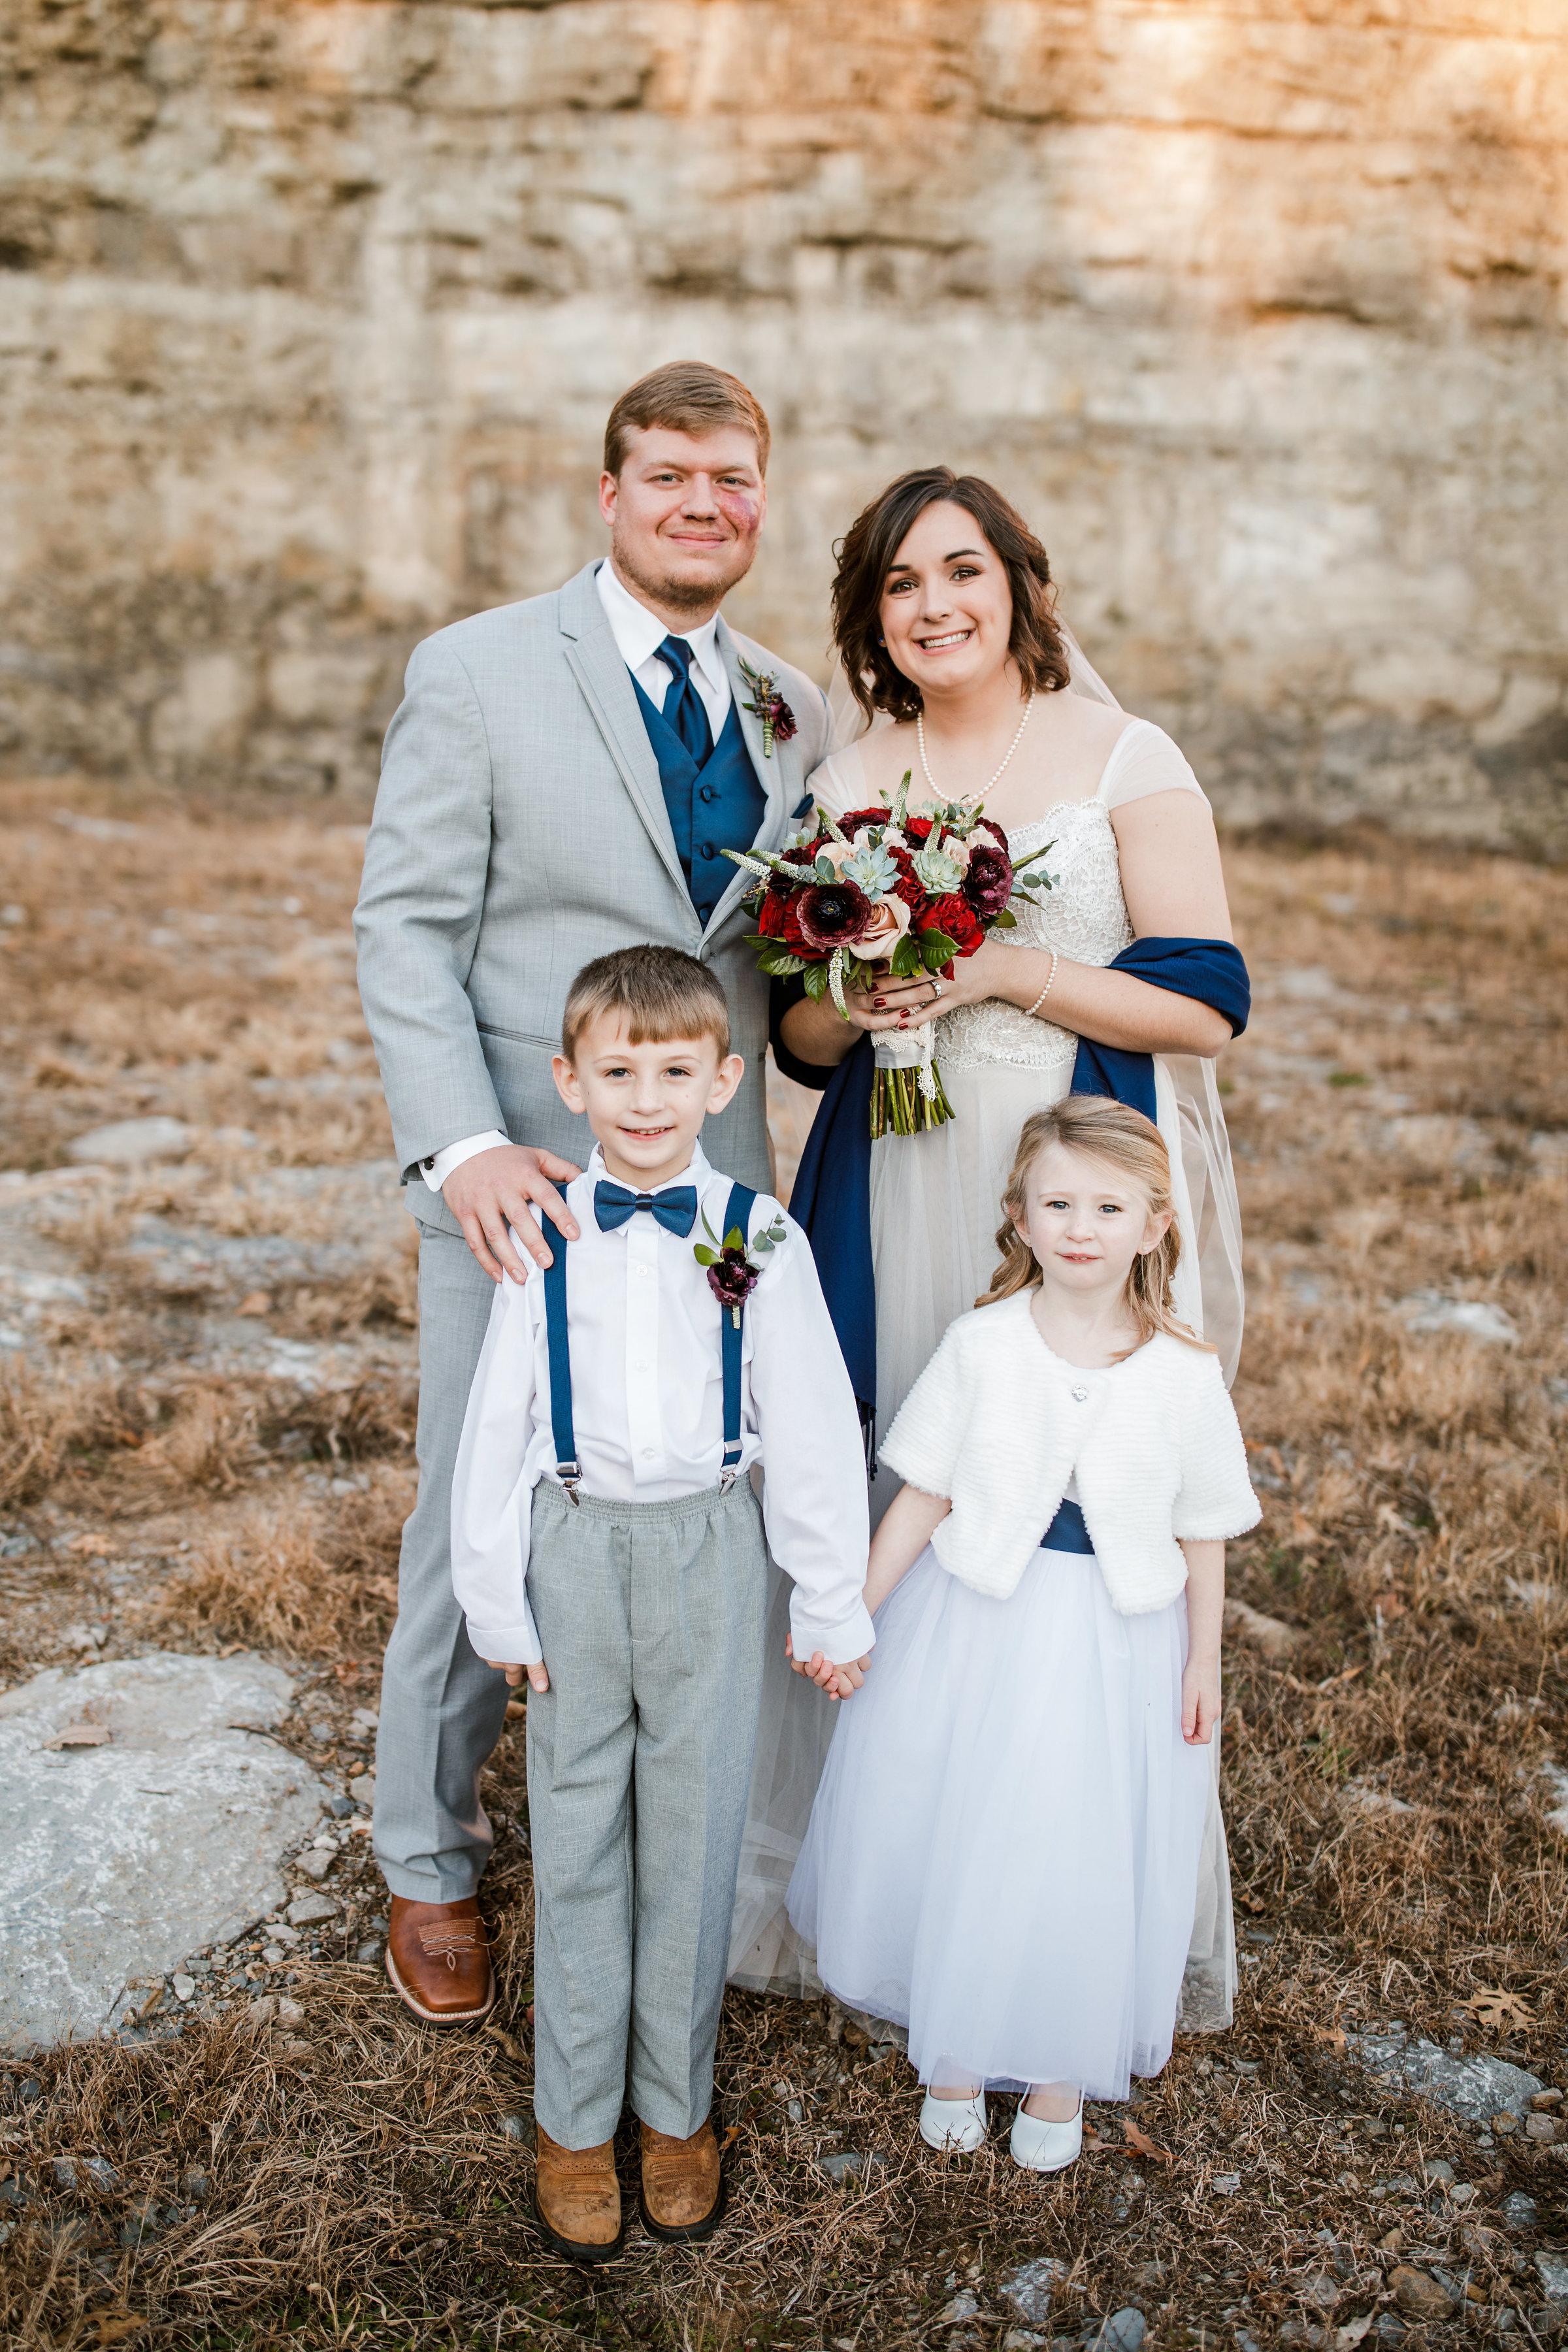 Graystone-Quarry-Wedding 53.jpg